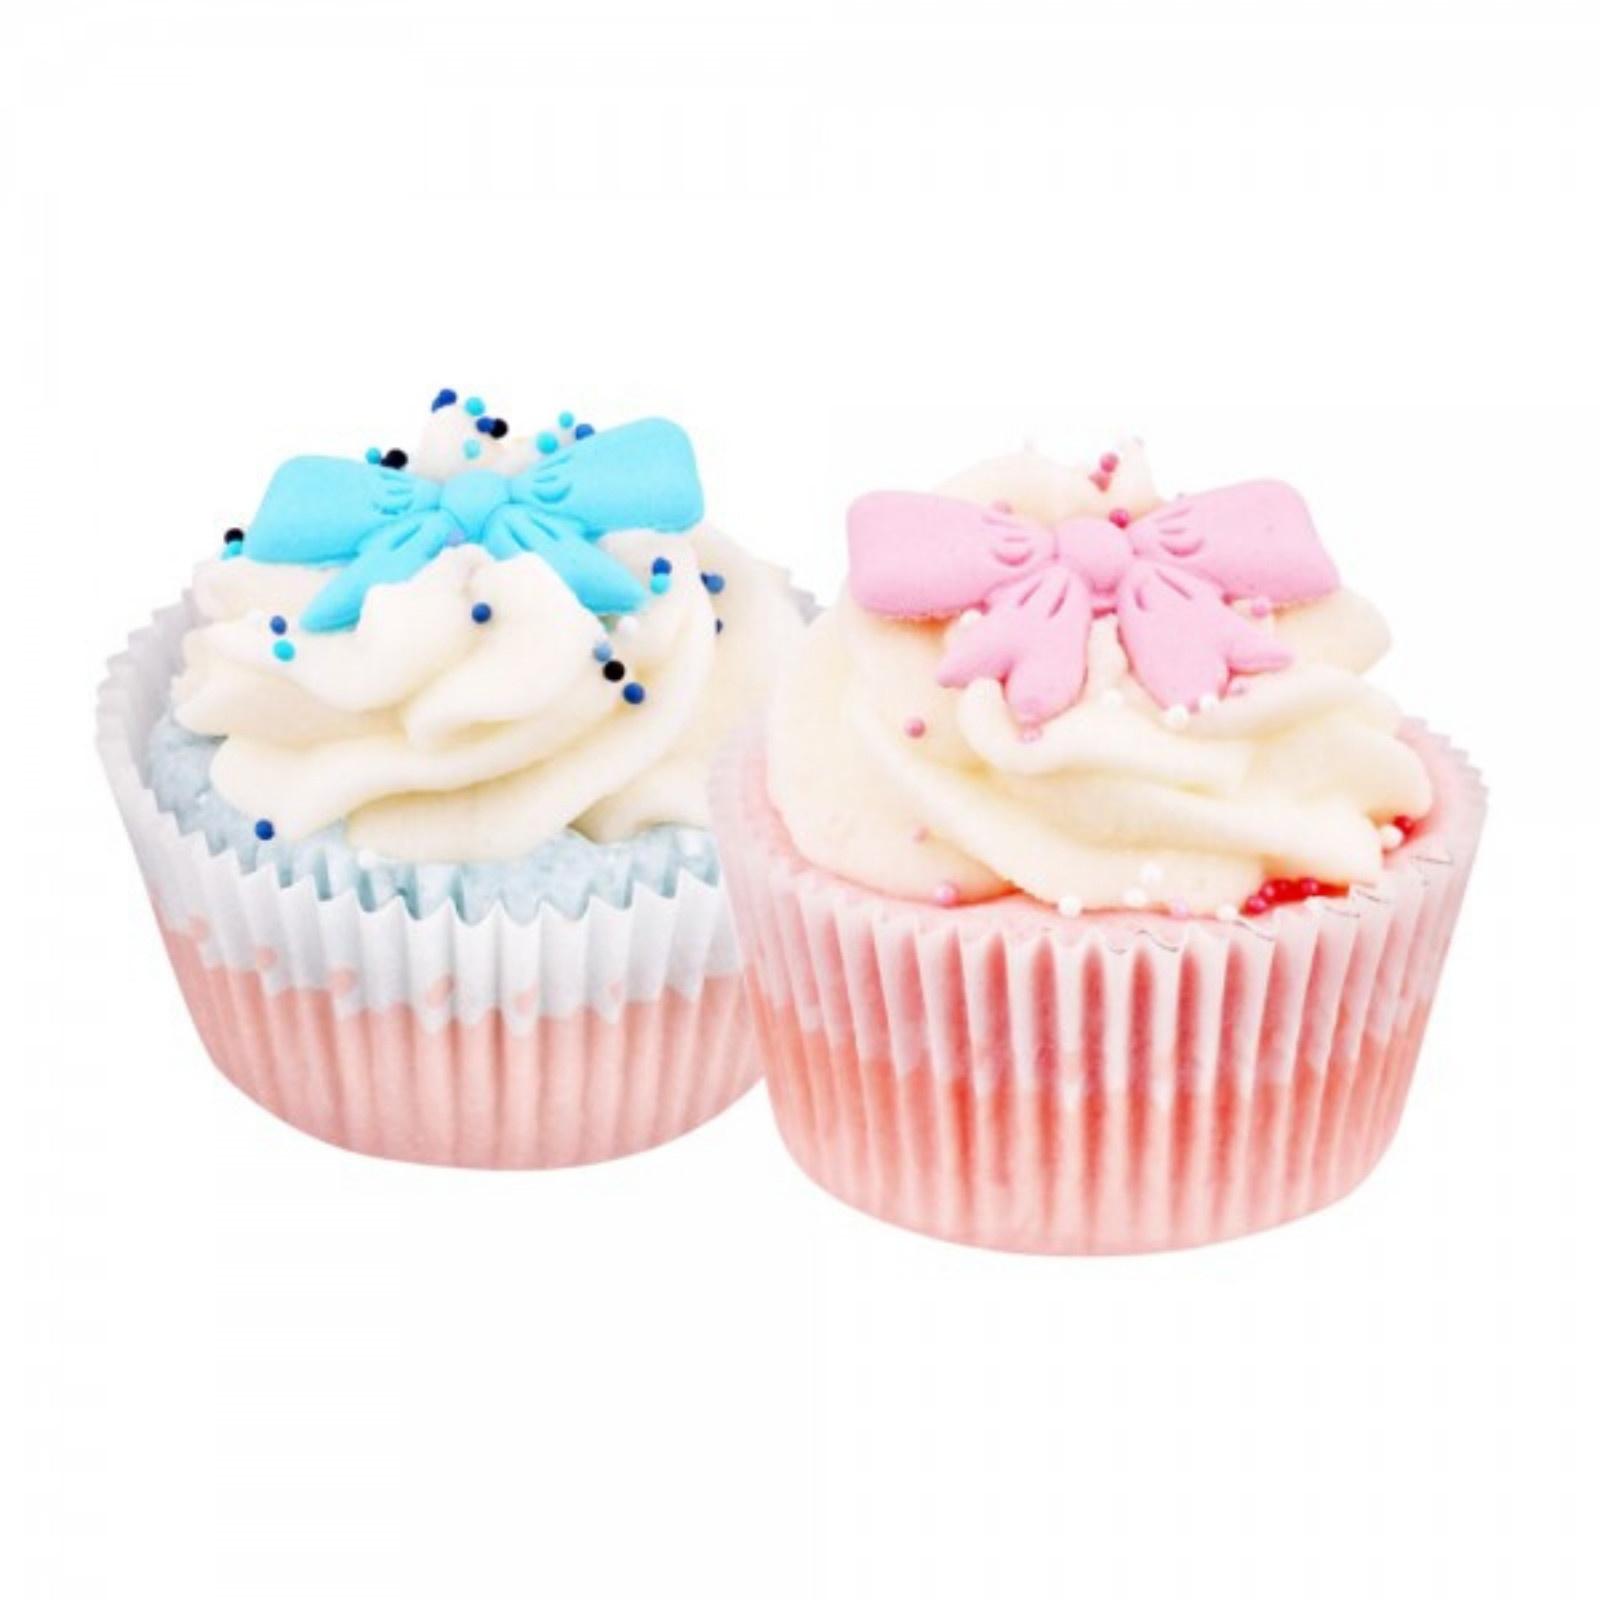 Badefee Bad Cupcake - Little Love